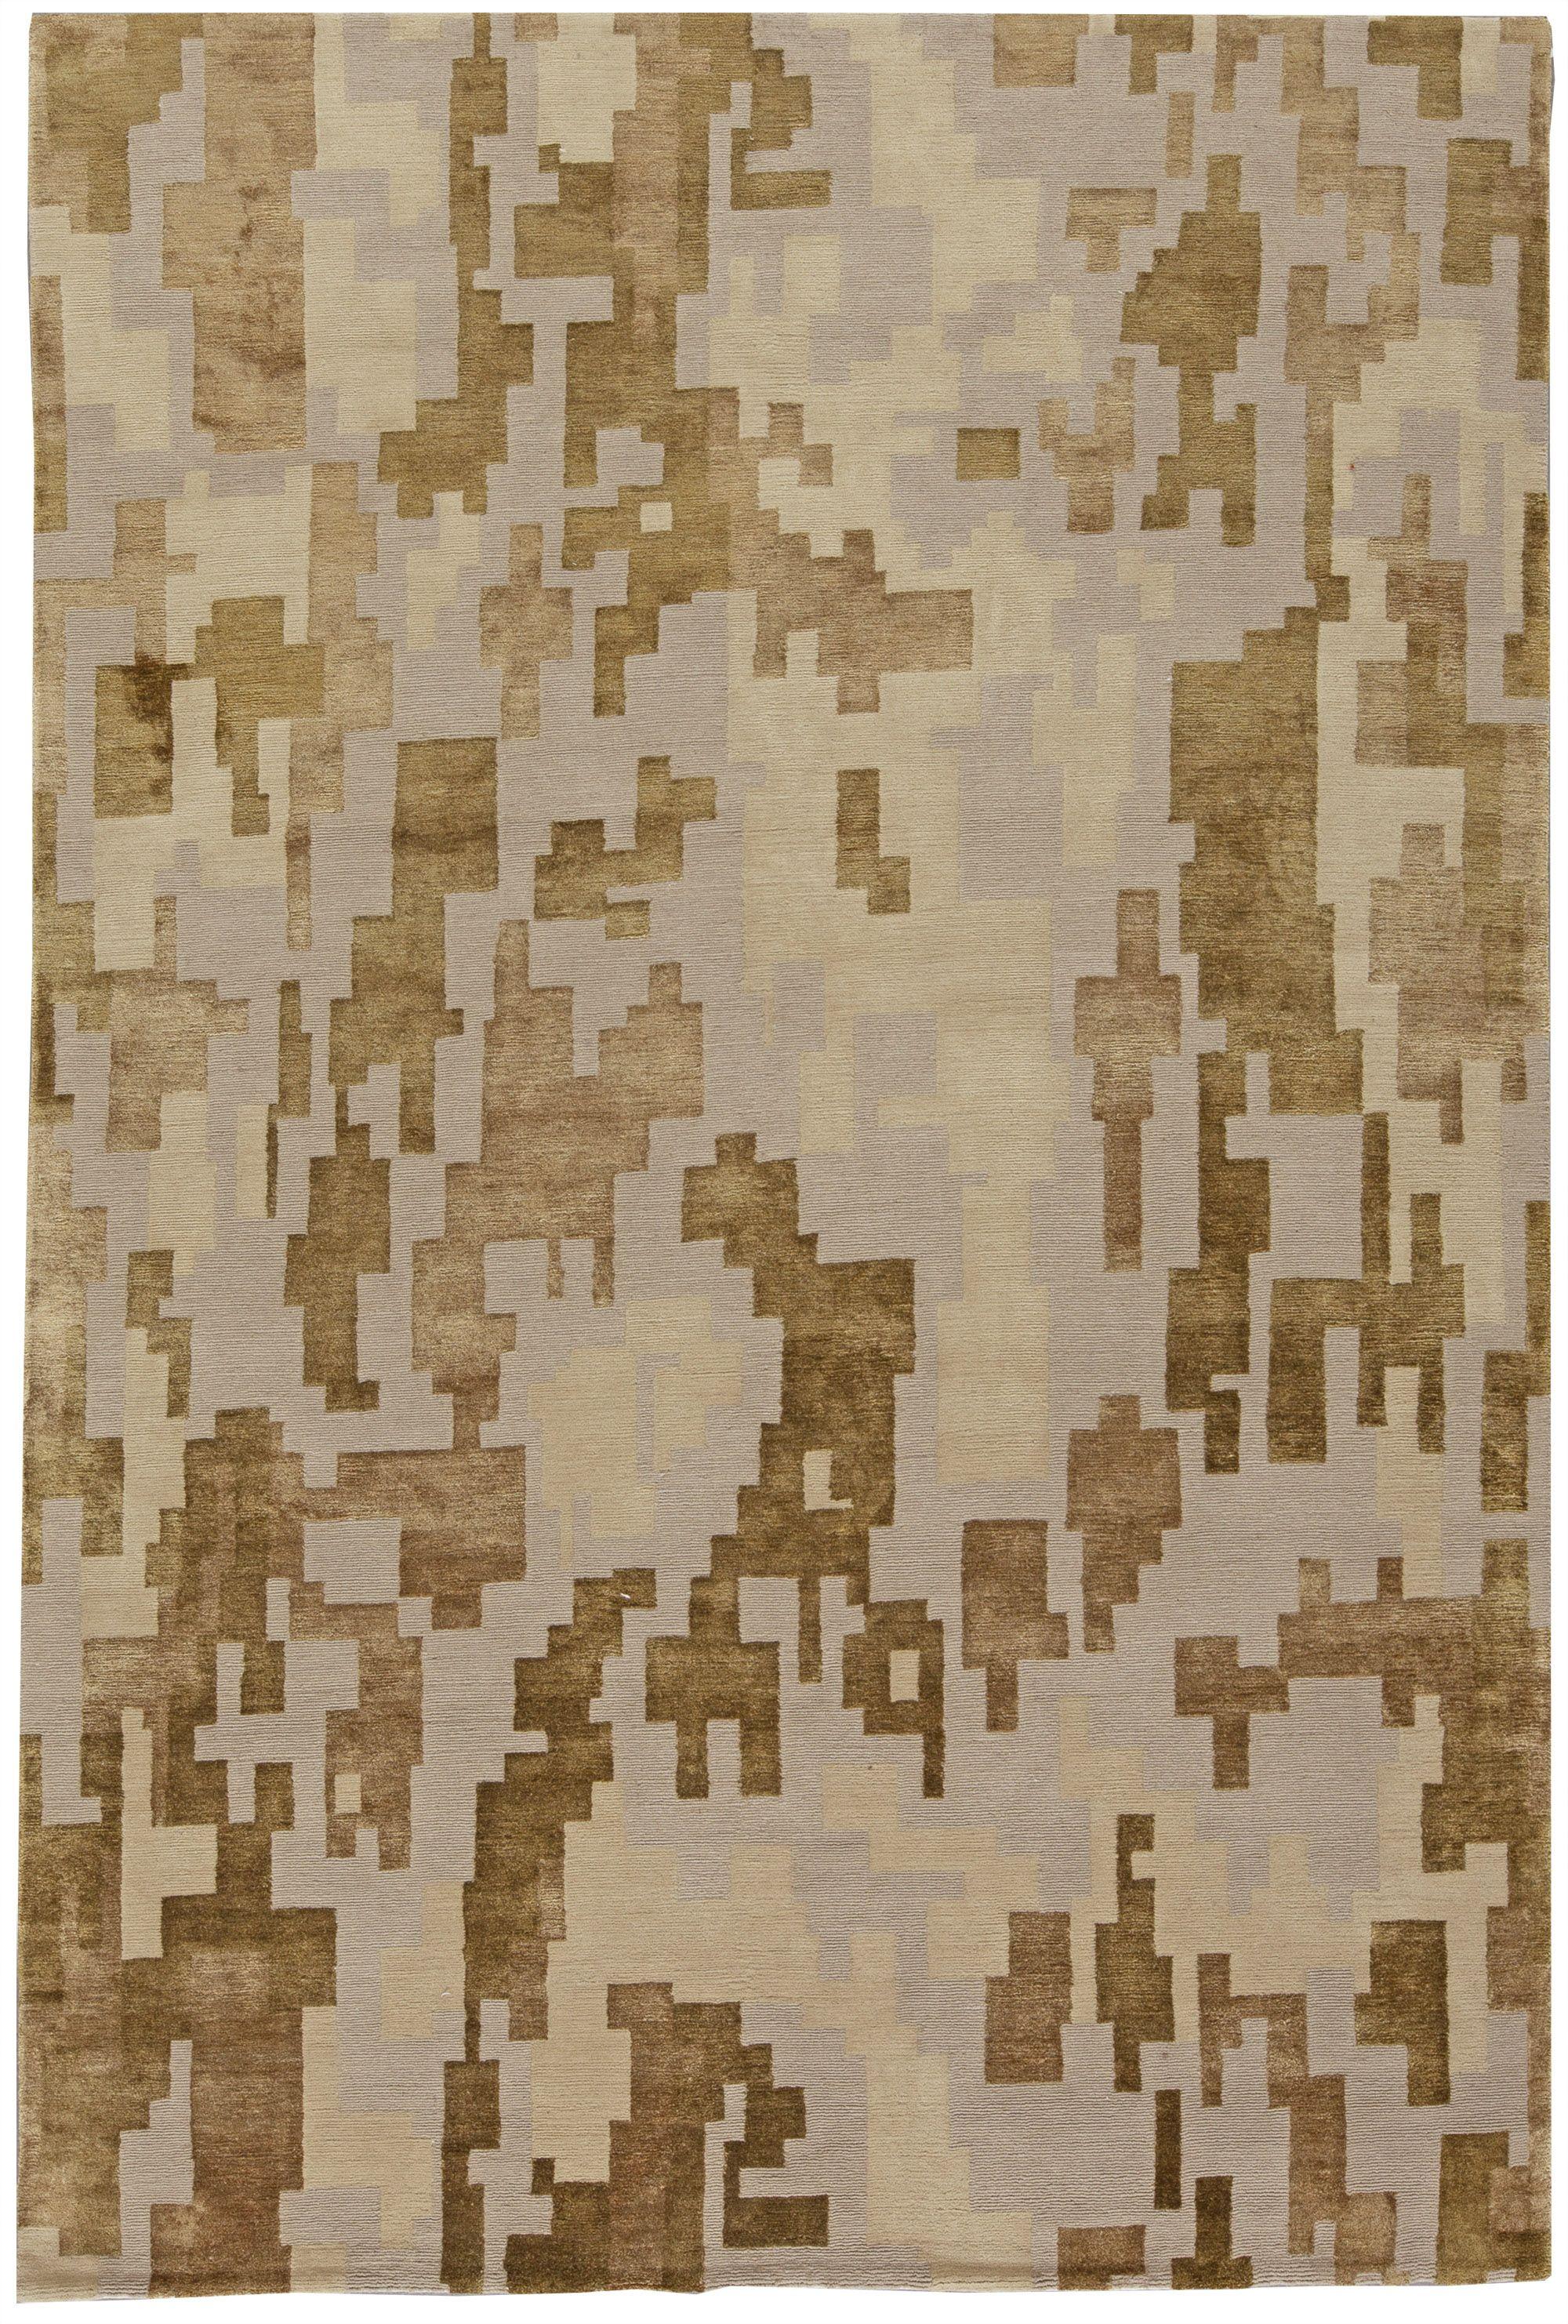 Arthur Dunnam Geometric Design Beige Golden Brown Wool Silk Rug N10755 By Dlb Rug Design Textured Carpet Carpet Sale